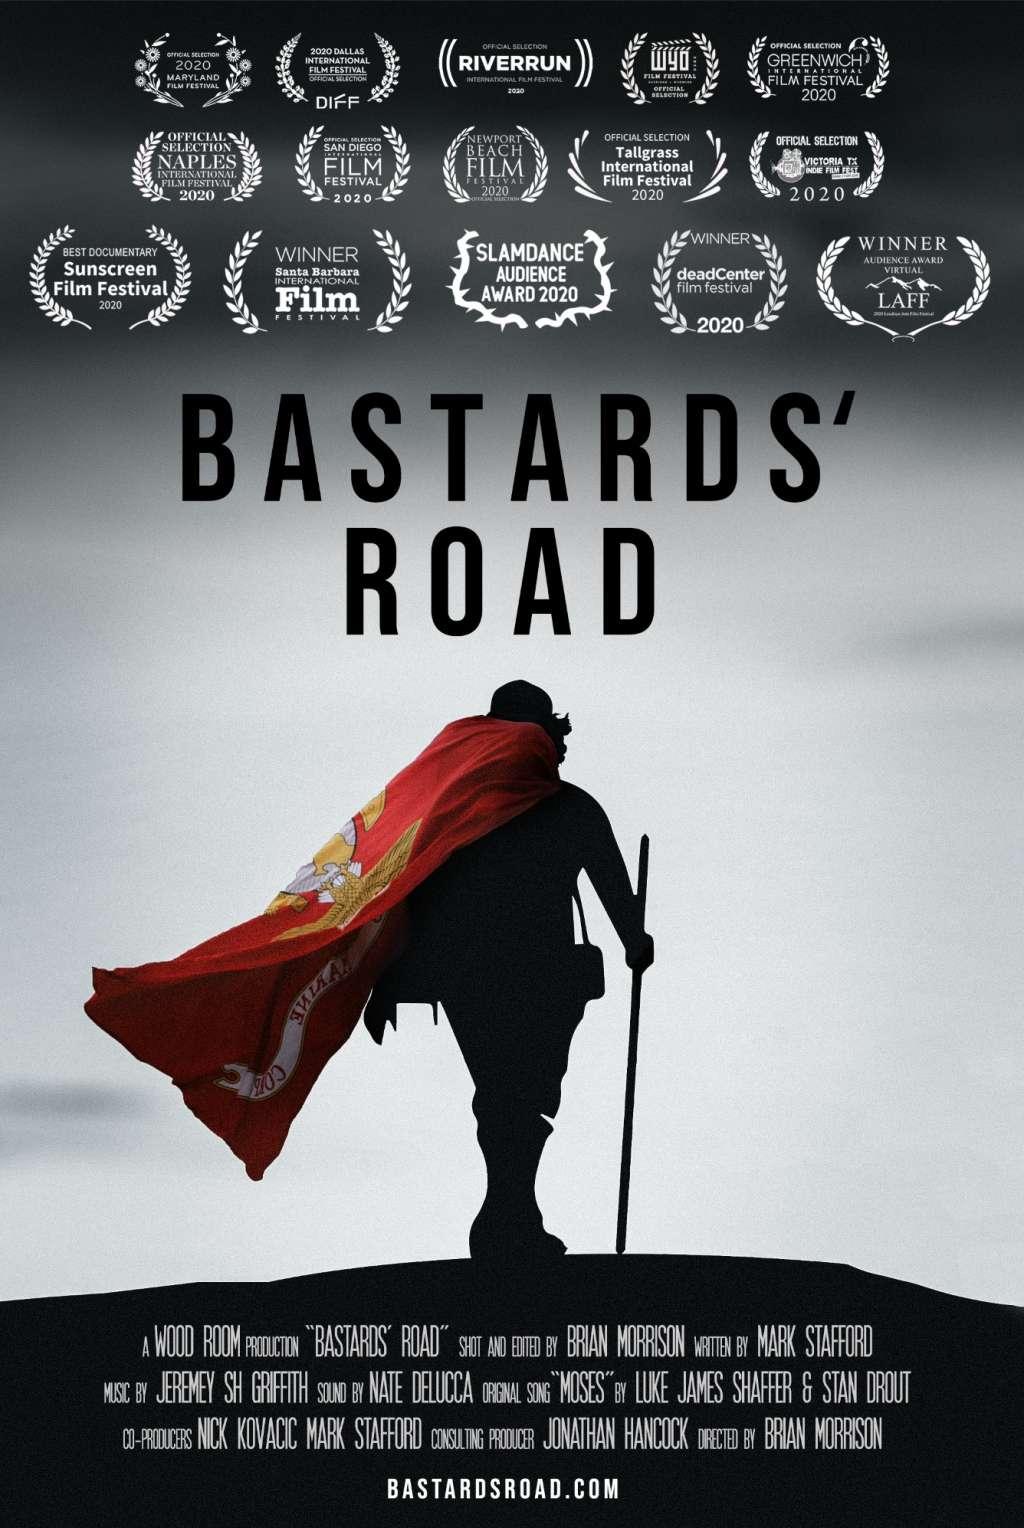 Bastards' Road kapak